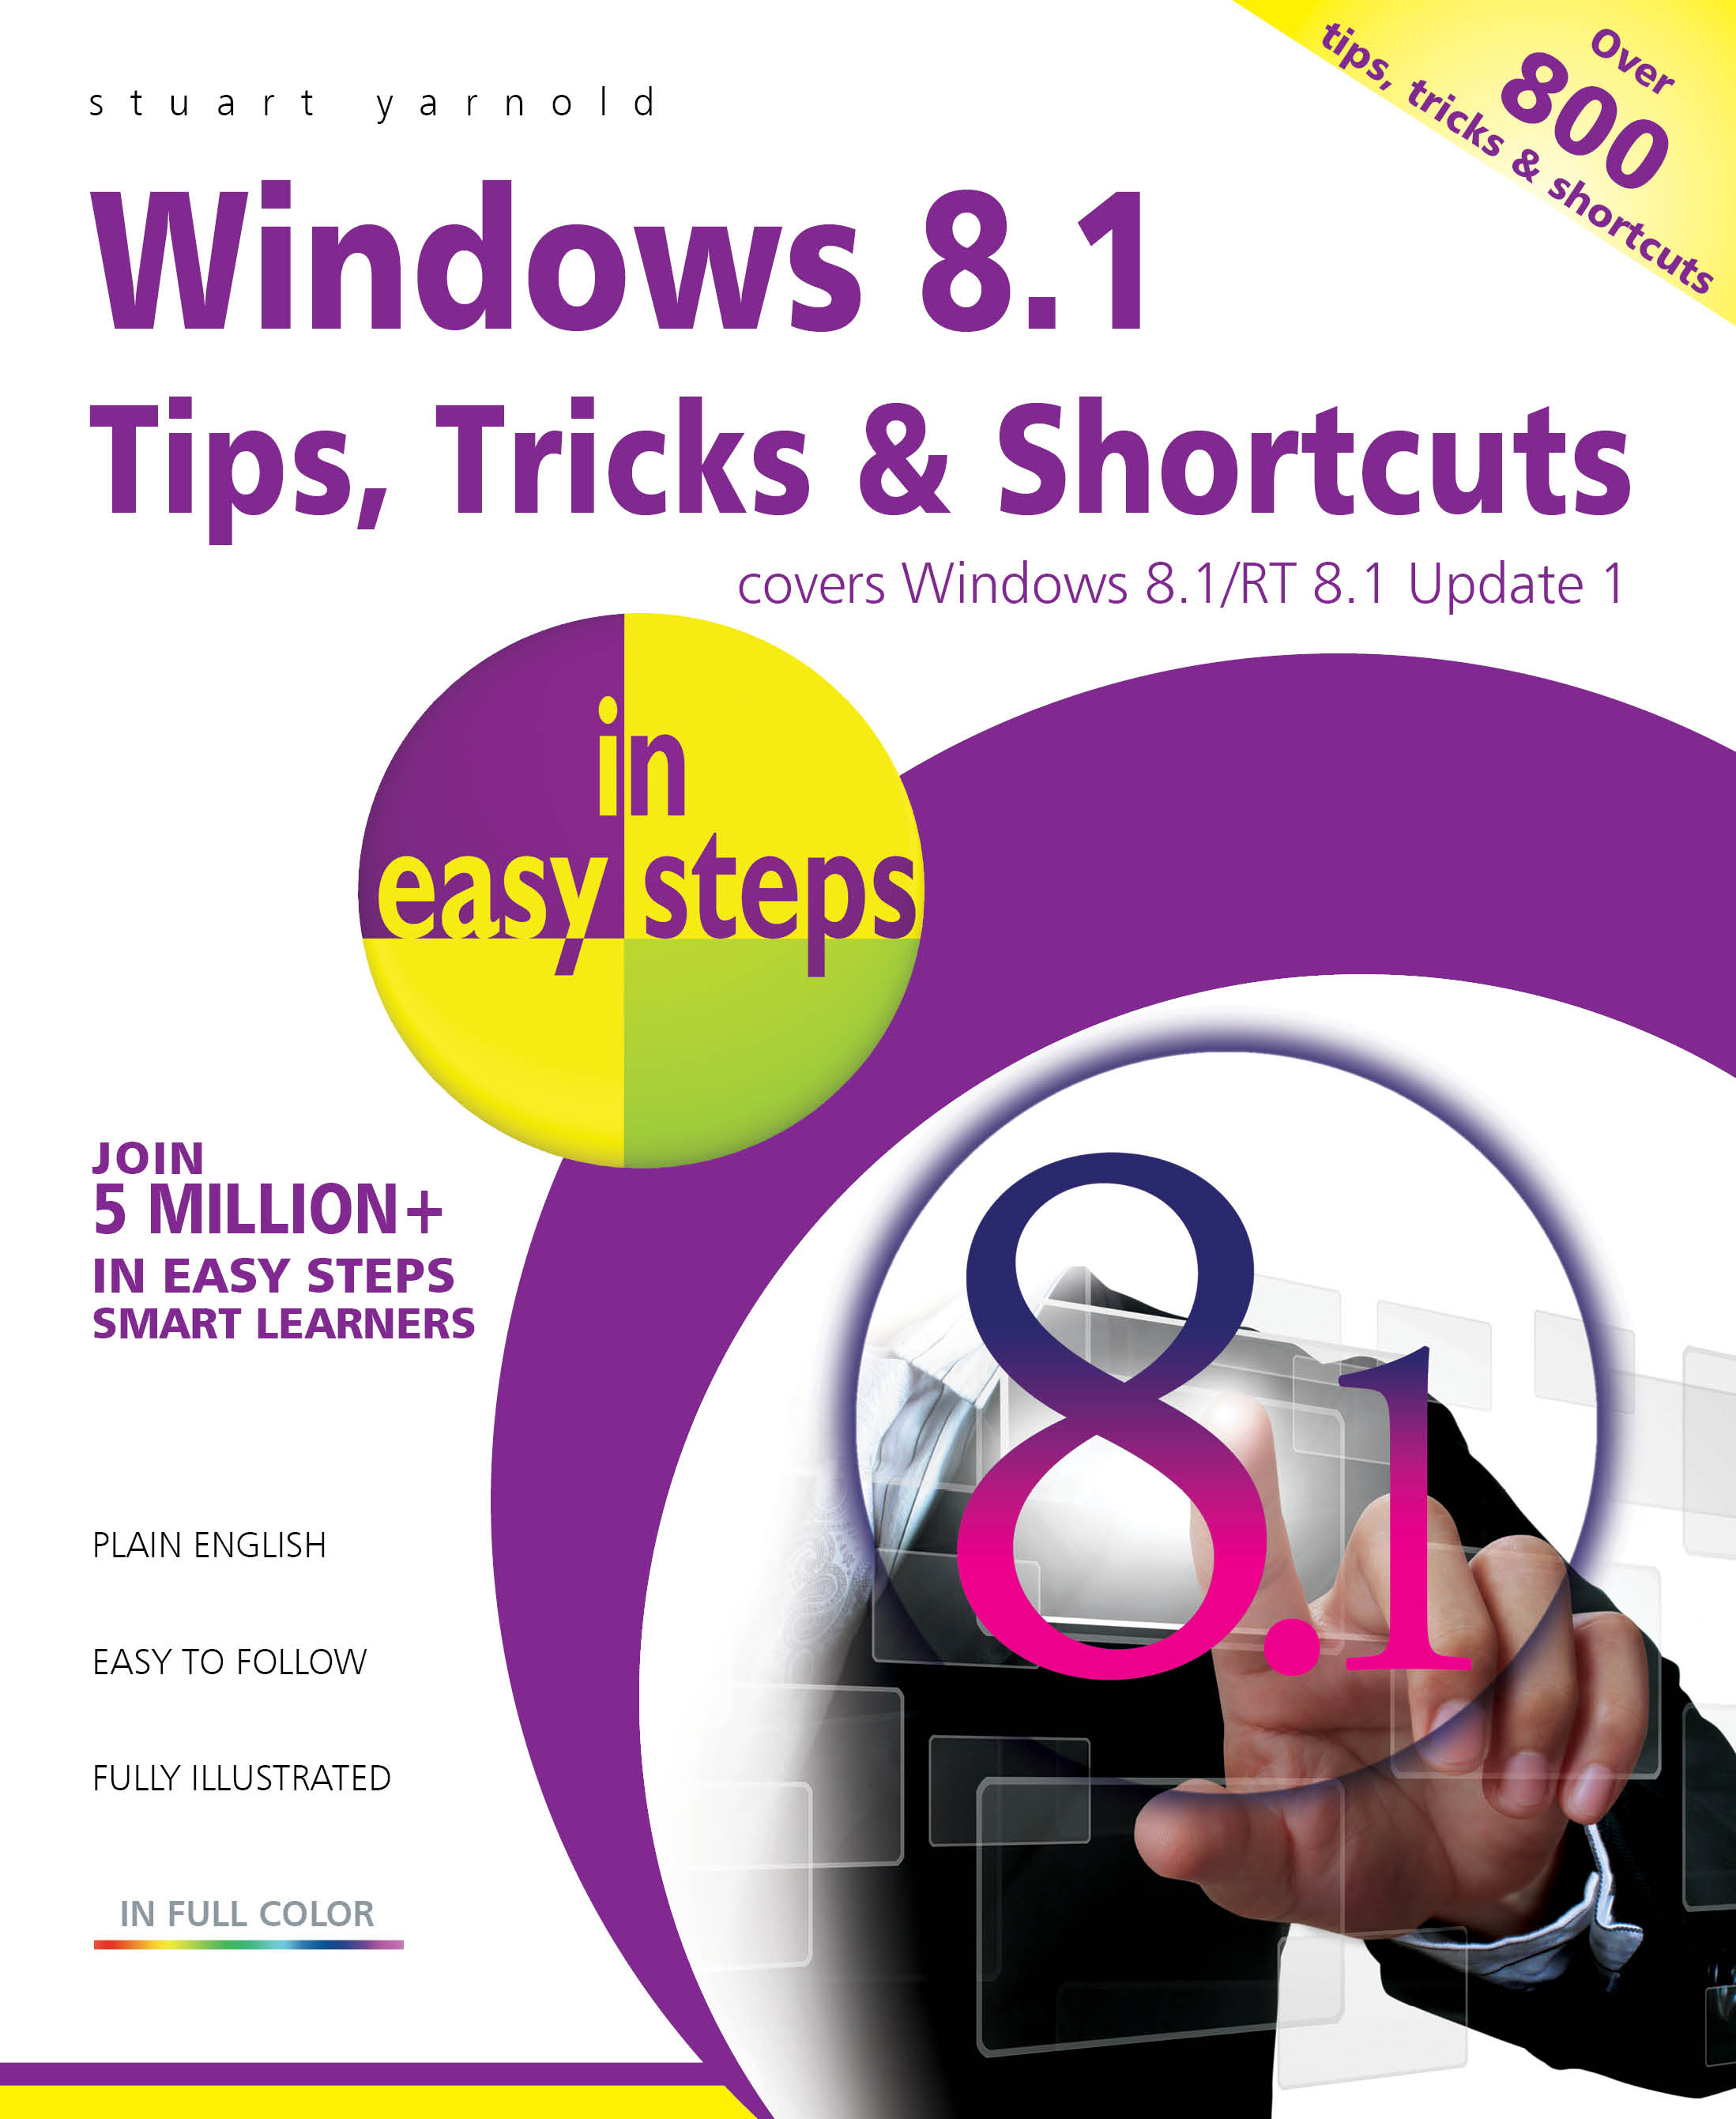 windows 8.1 tips and tricks pdf